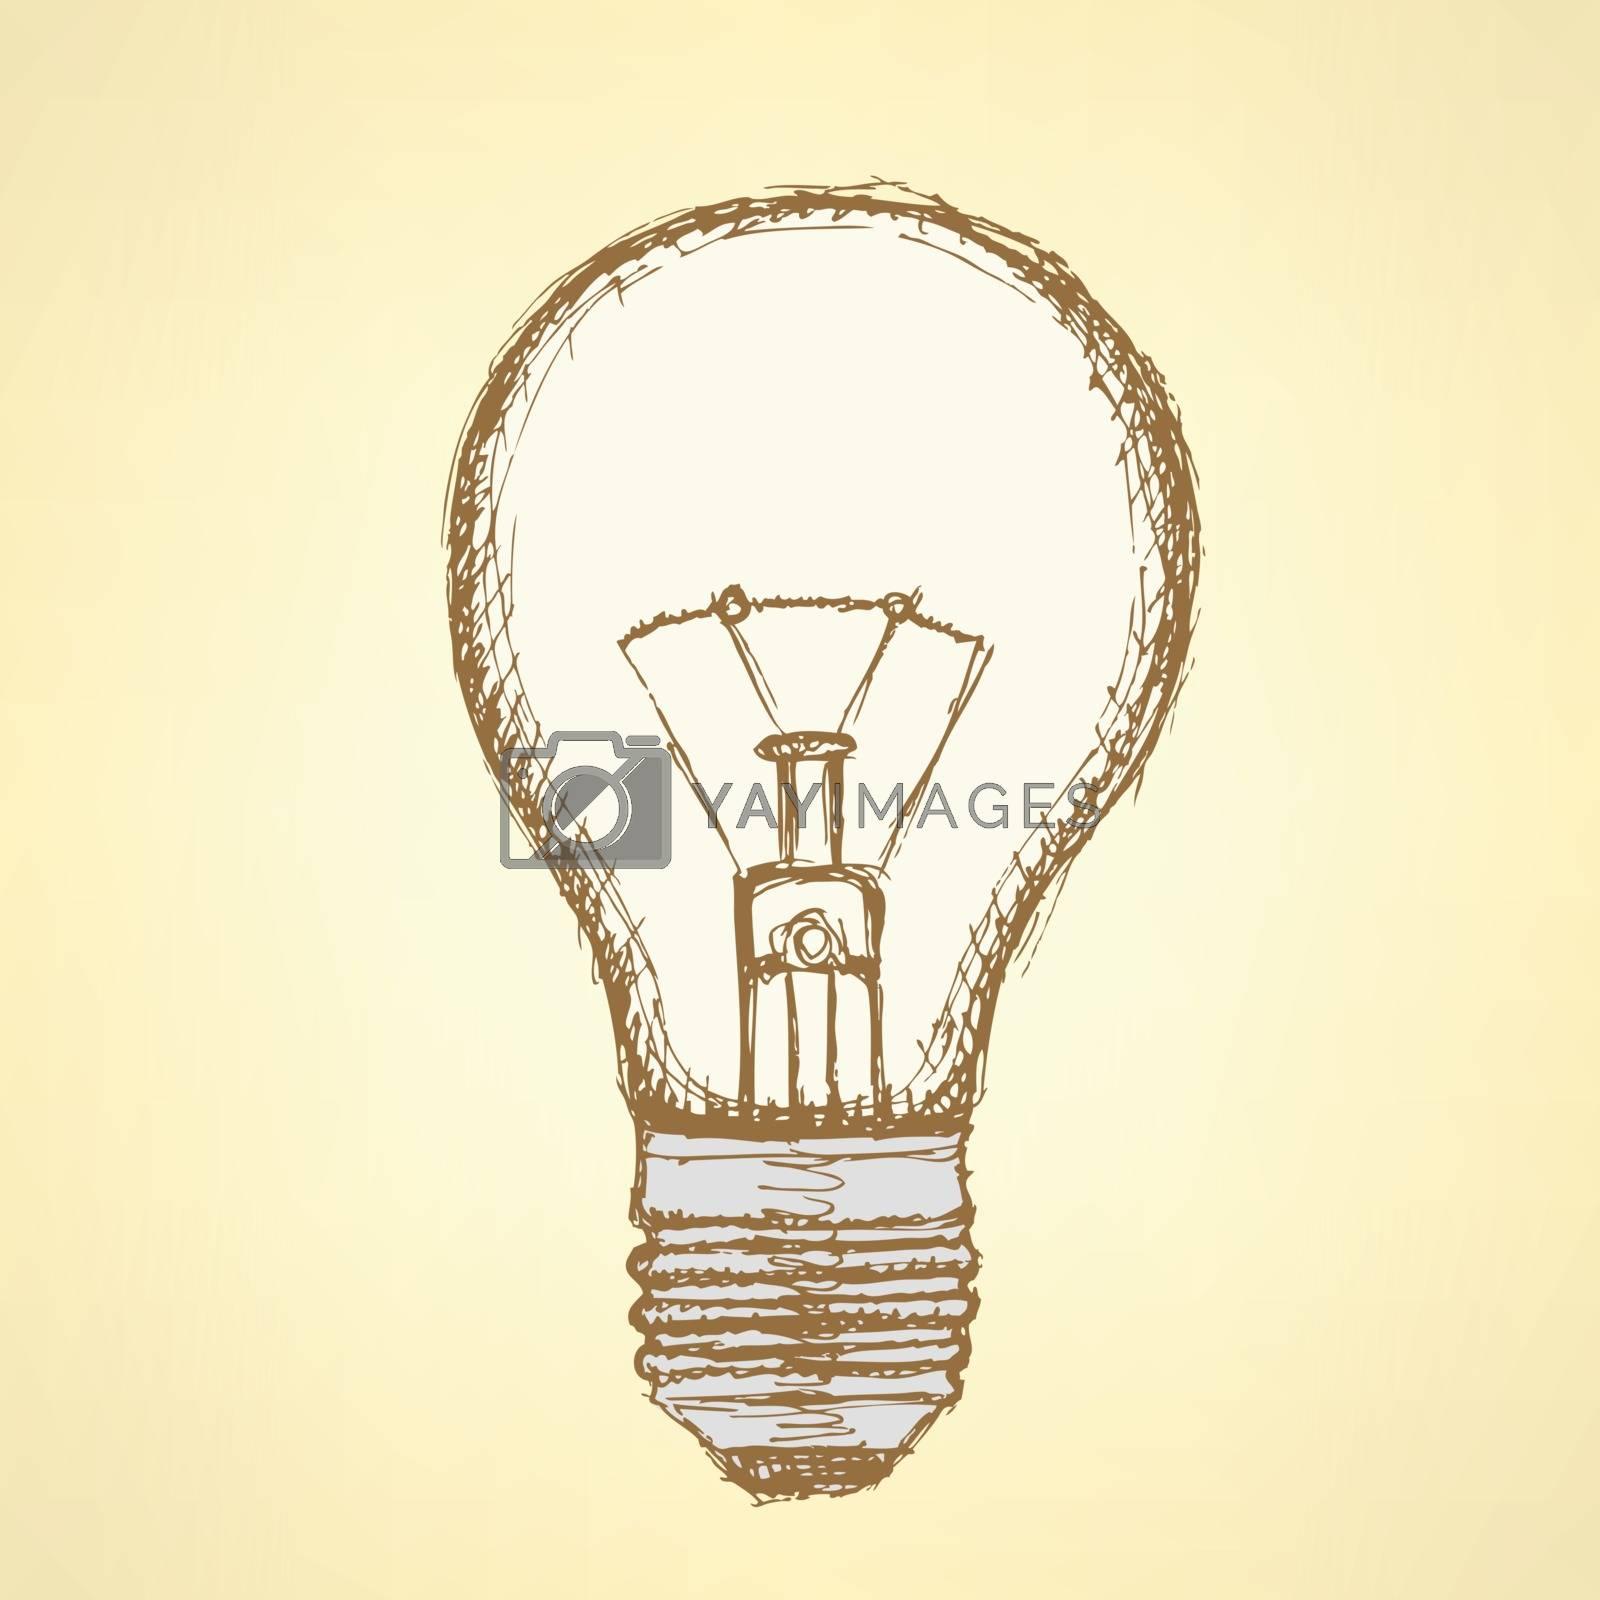 Sketch light bulb in vintage style, vector